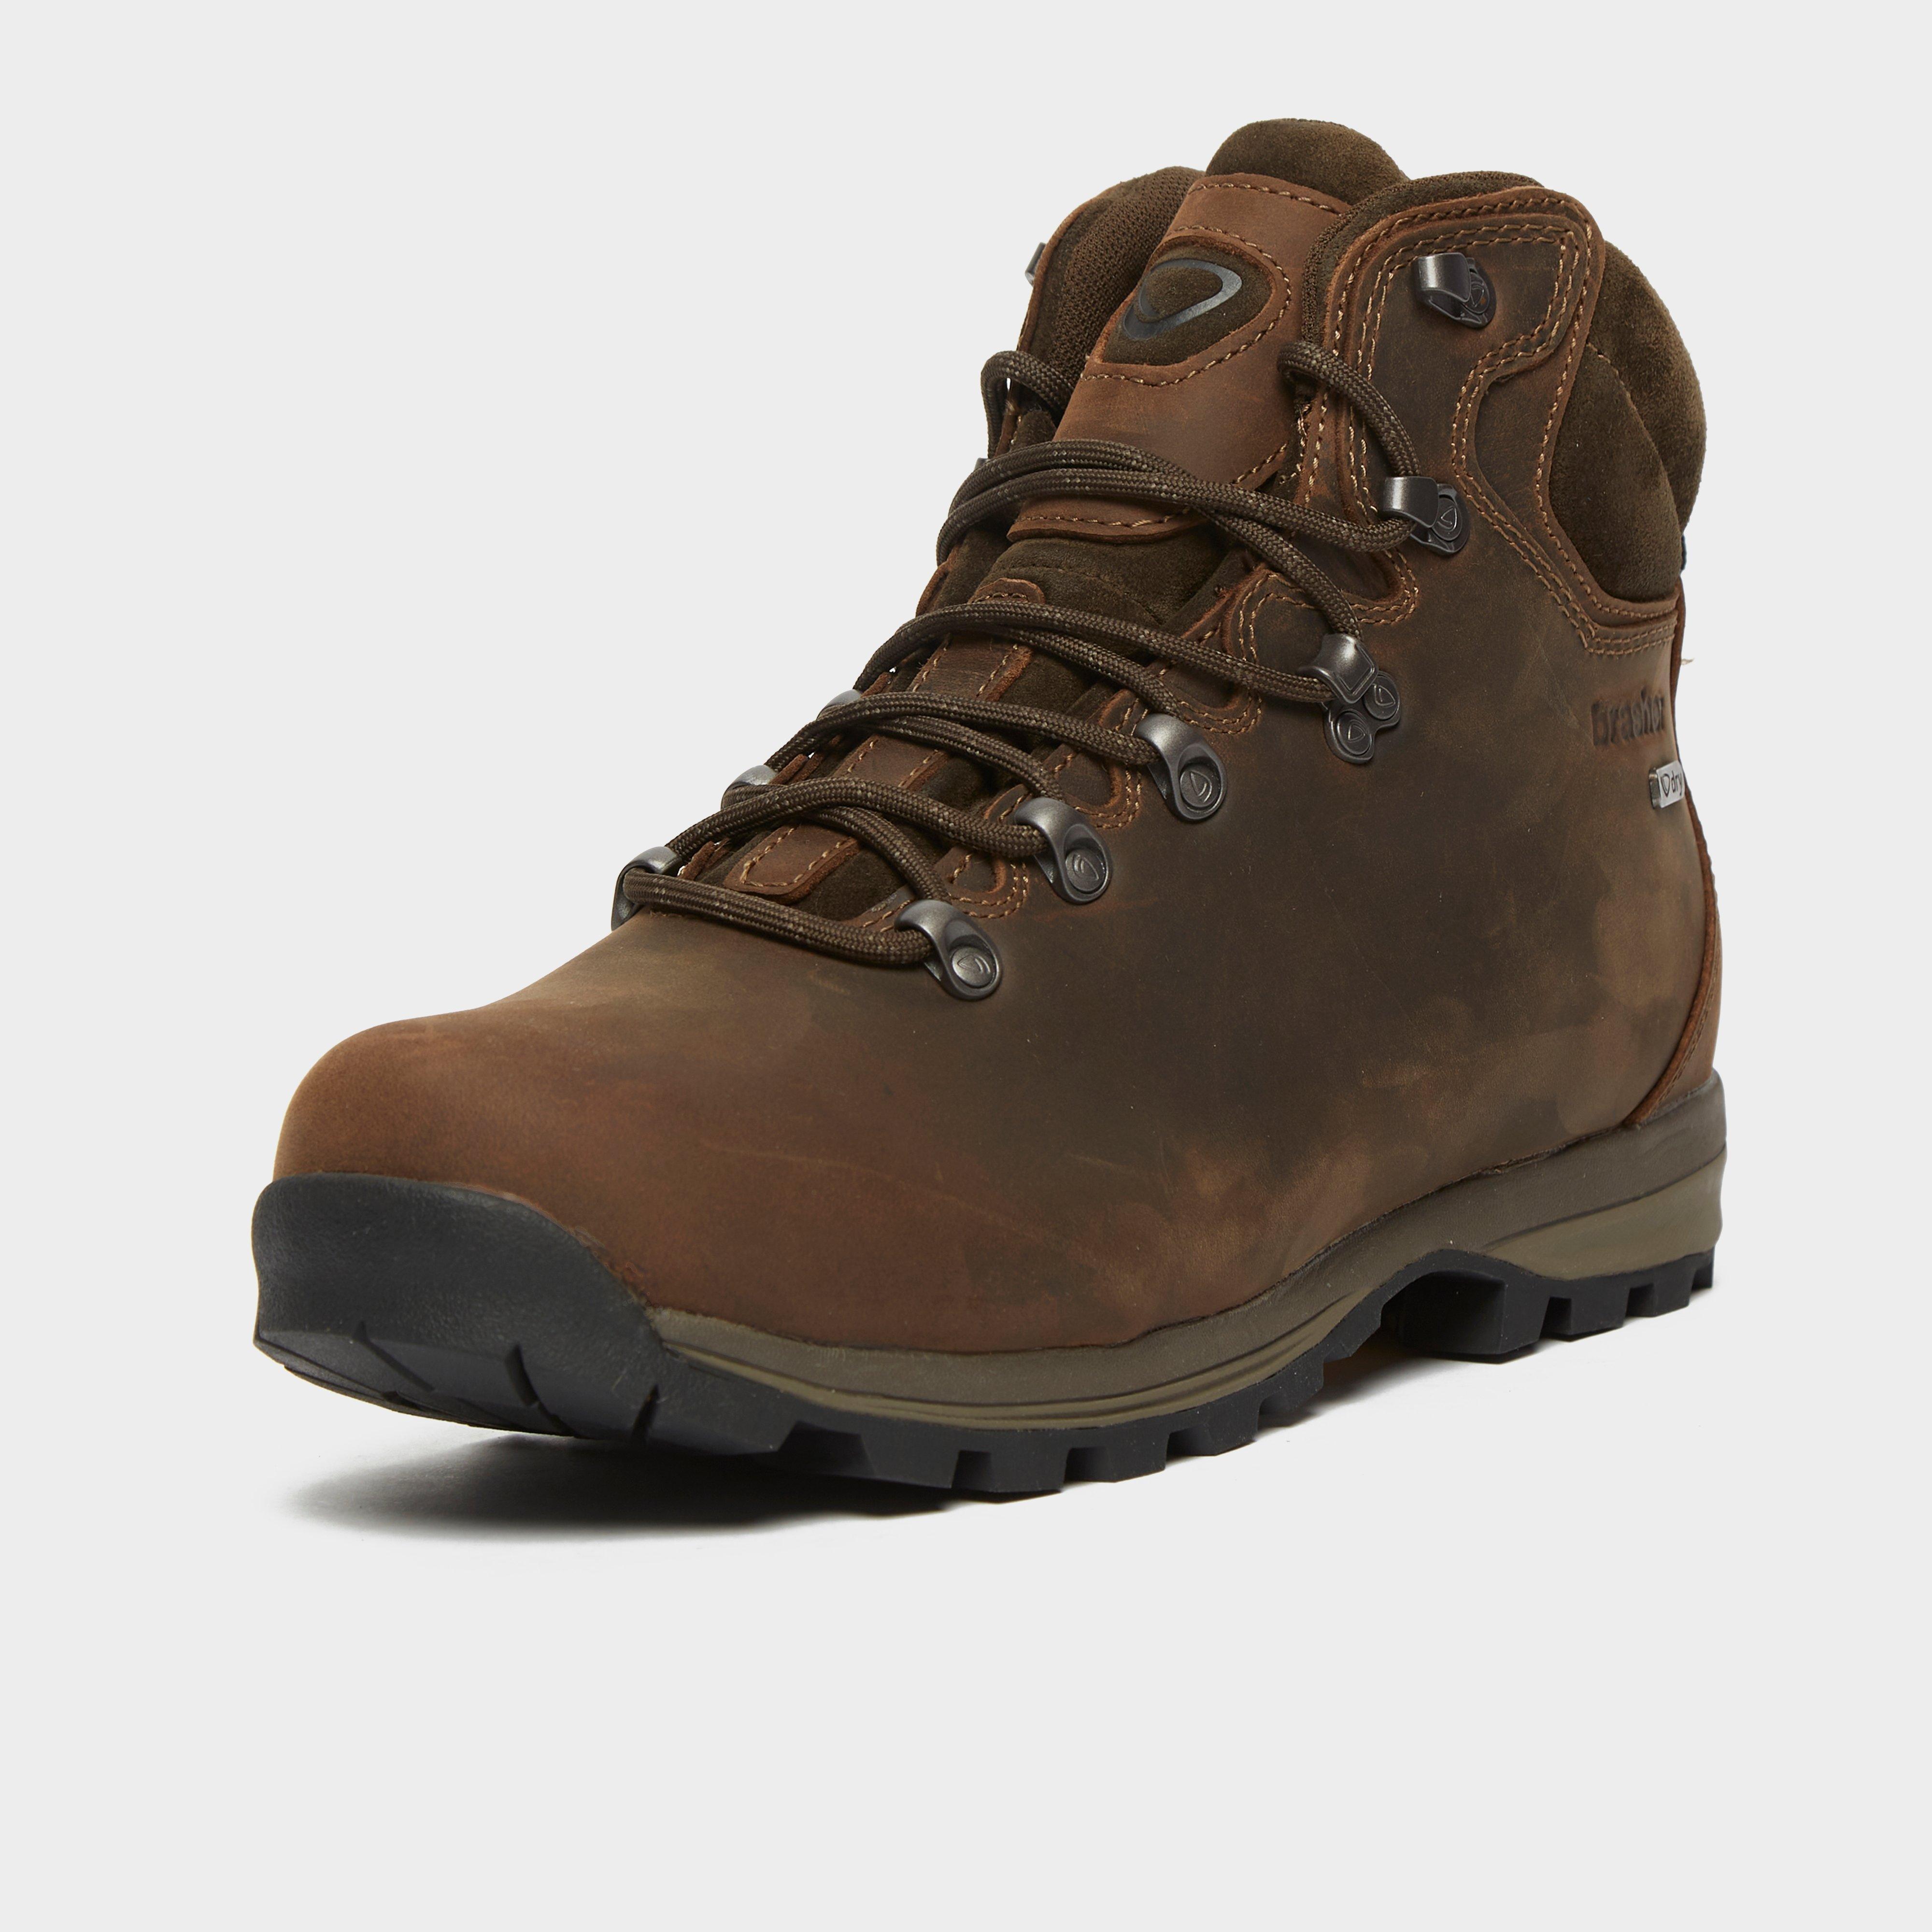 BRASKER MID - Walking boots - brown Cheap Really 2018 New For Sale OYeN8